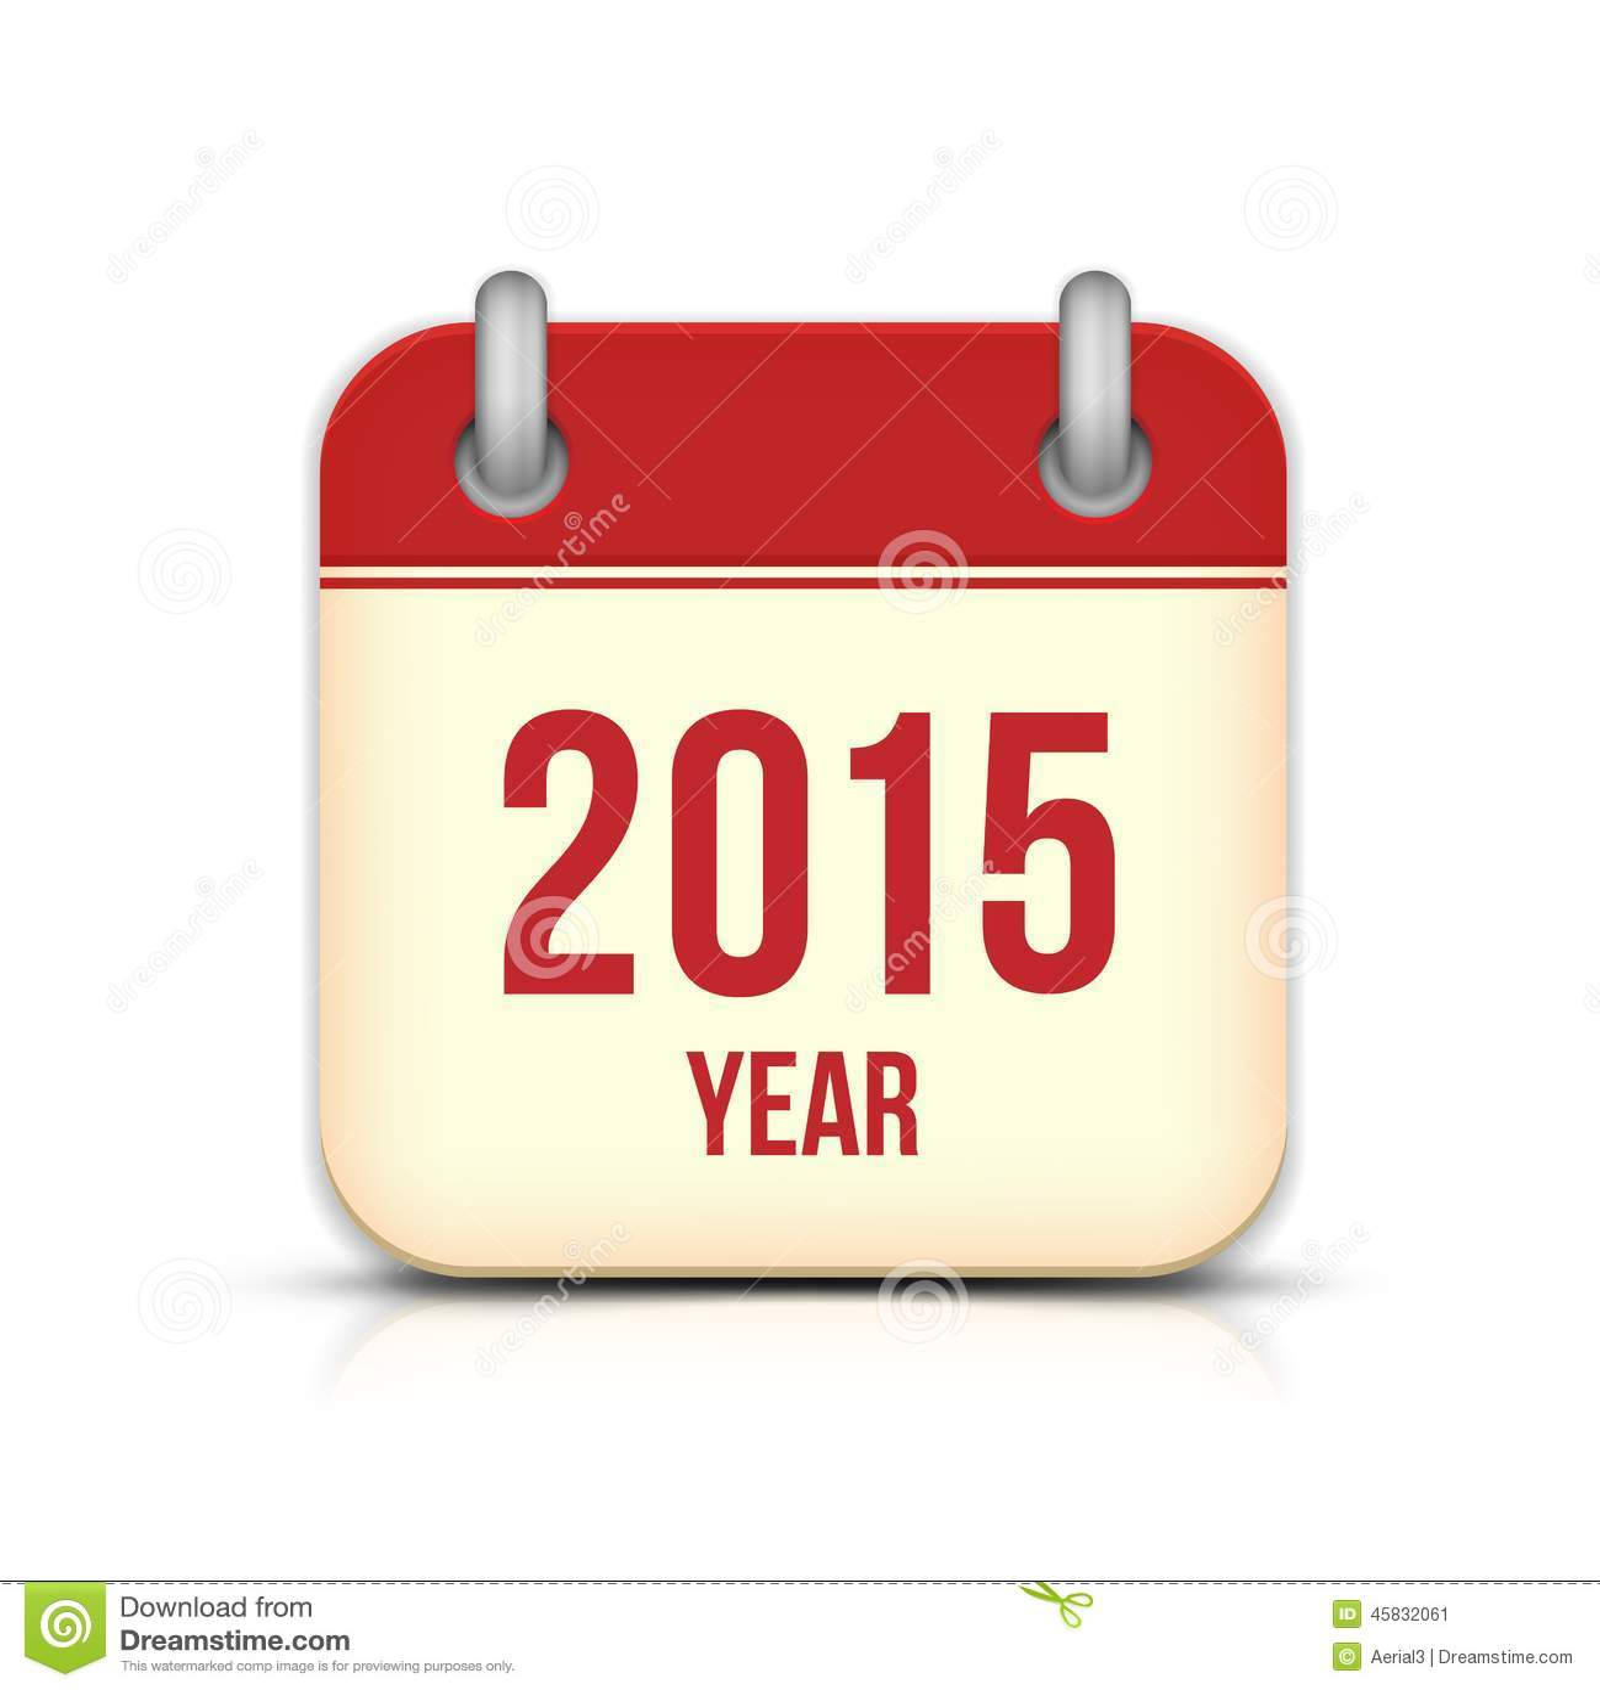 Year Calendar App : Year vector calendar app icon with reflection stock